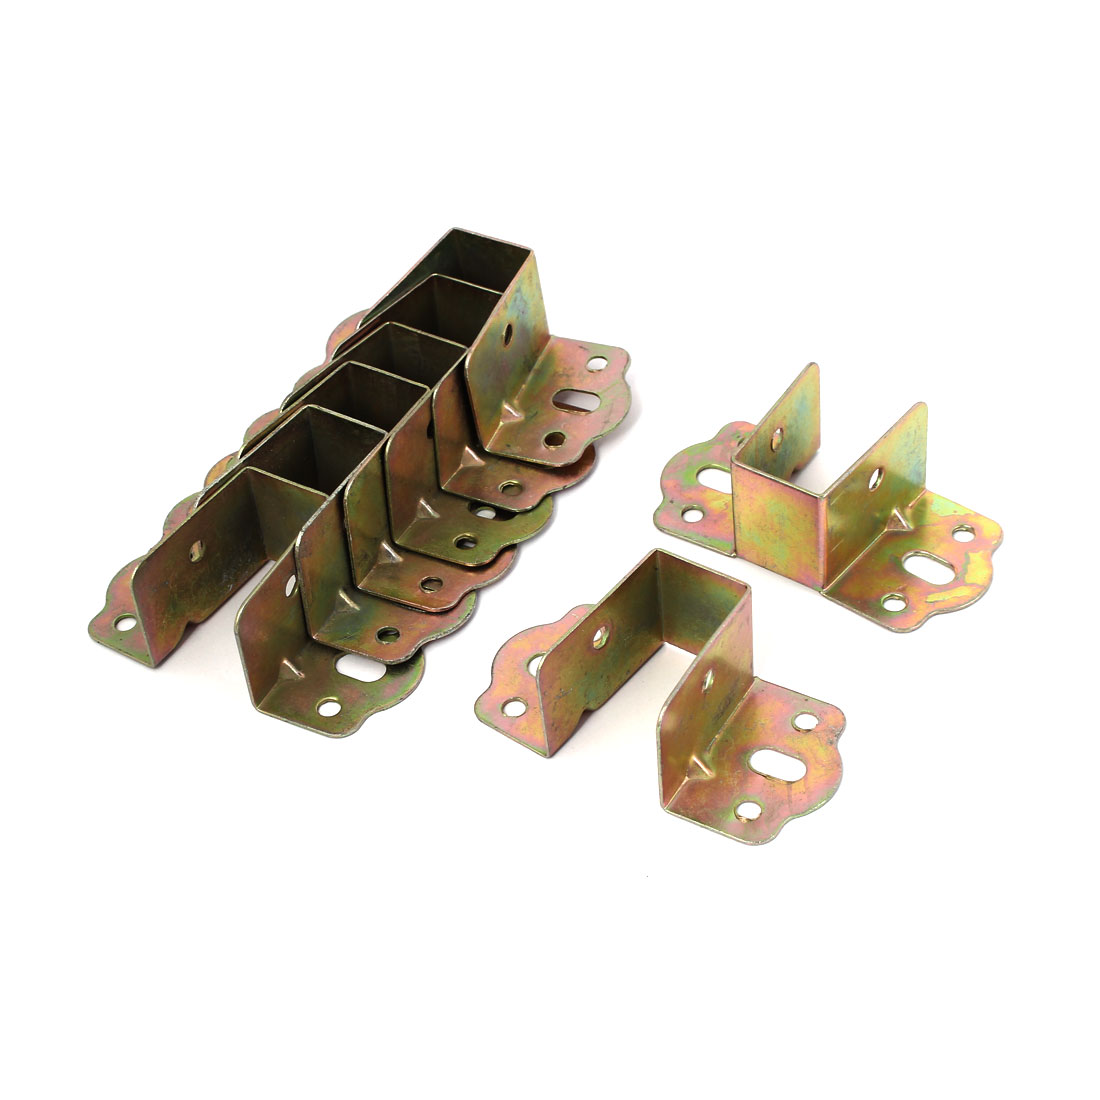 68mm x 40mm x 28mm 8 Holes Metal Bed Angle Brackets Hardware Bronze Tone 8 Pcs